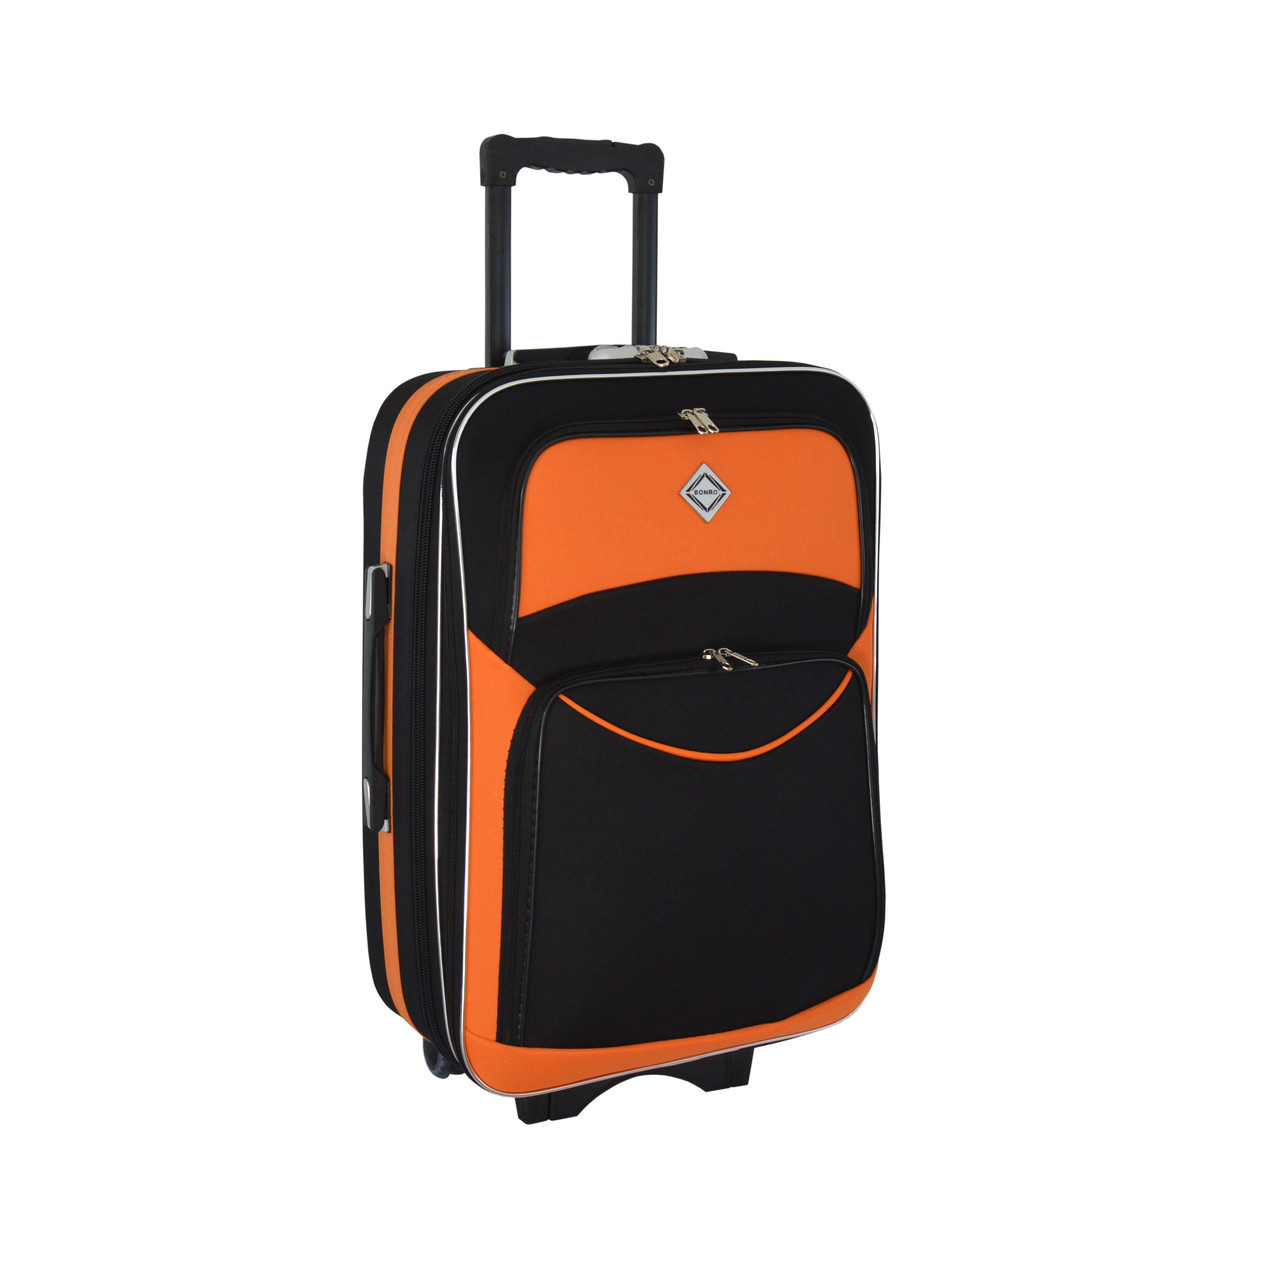 Чемодан Bonro Style (большой) черно-оранжевый